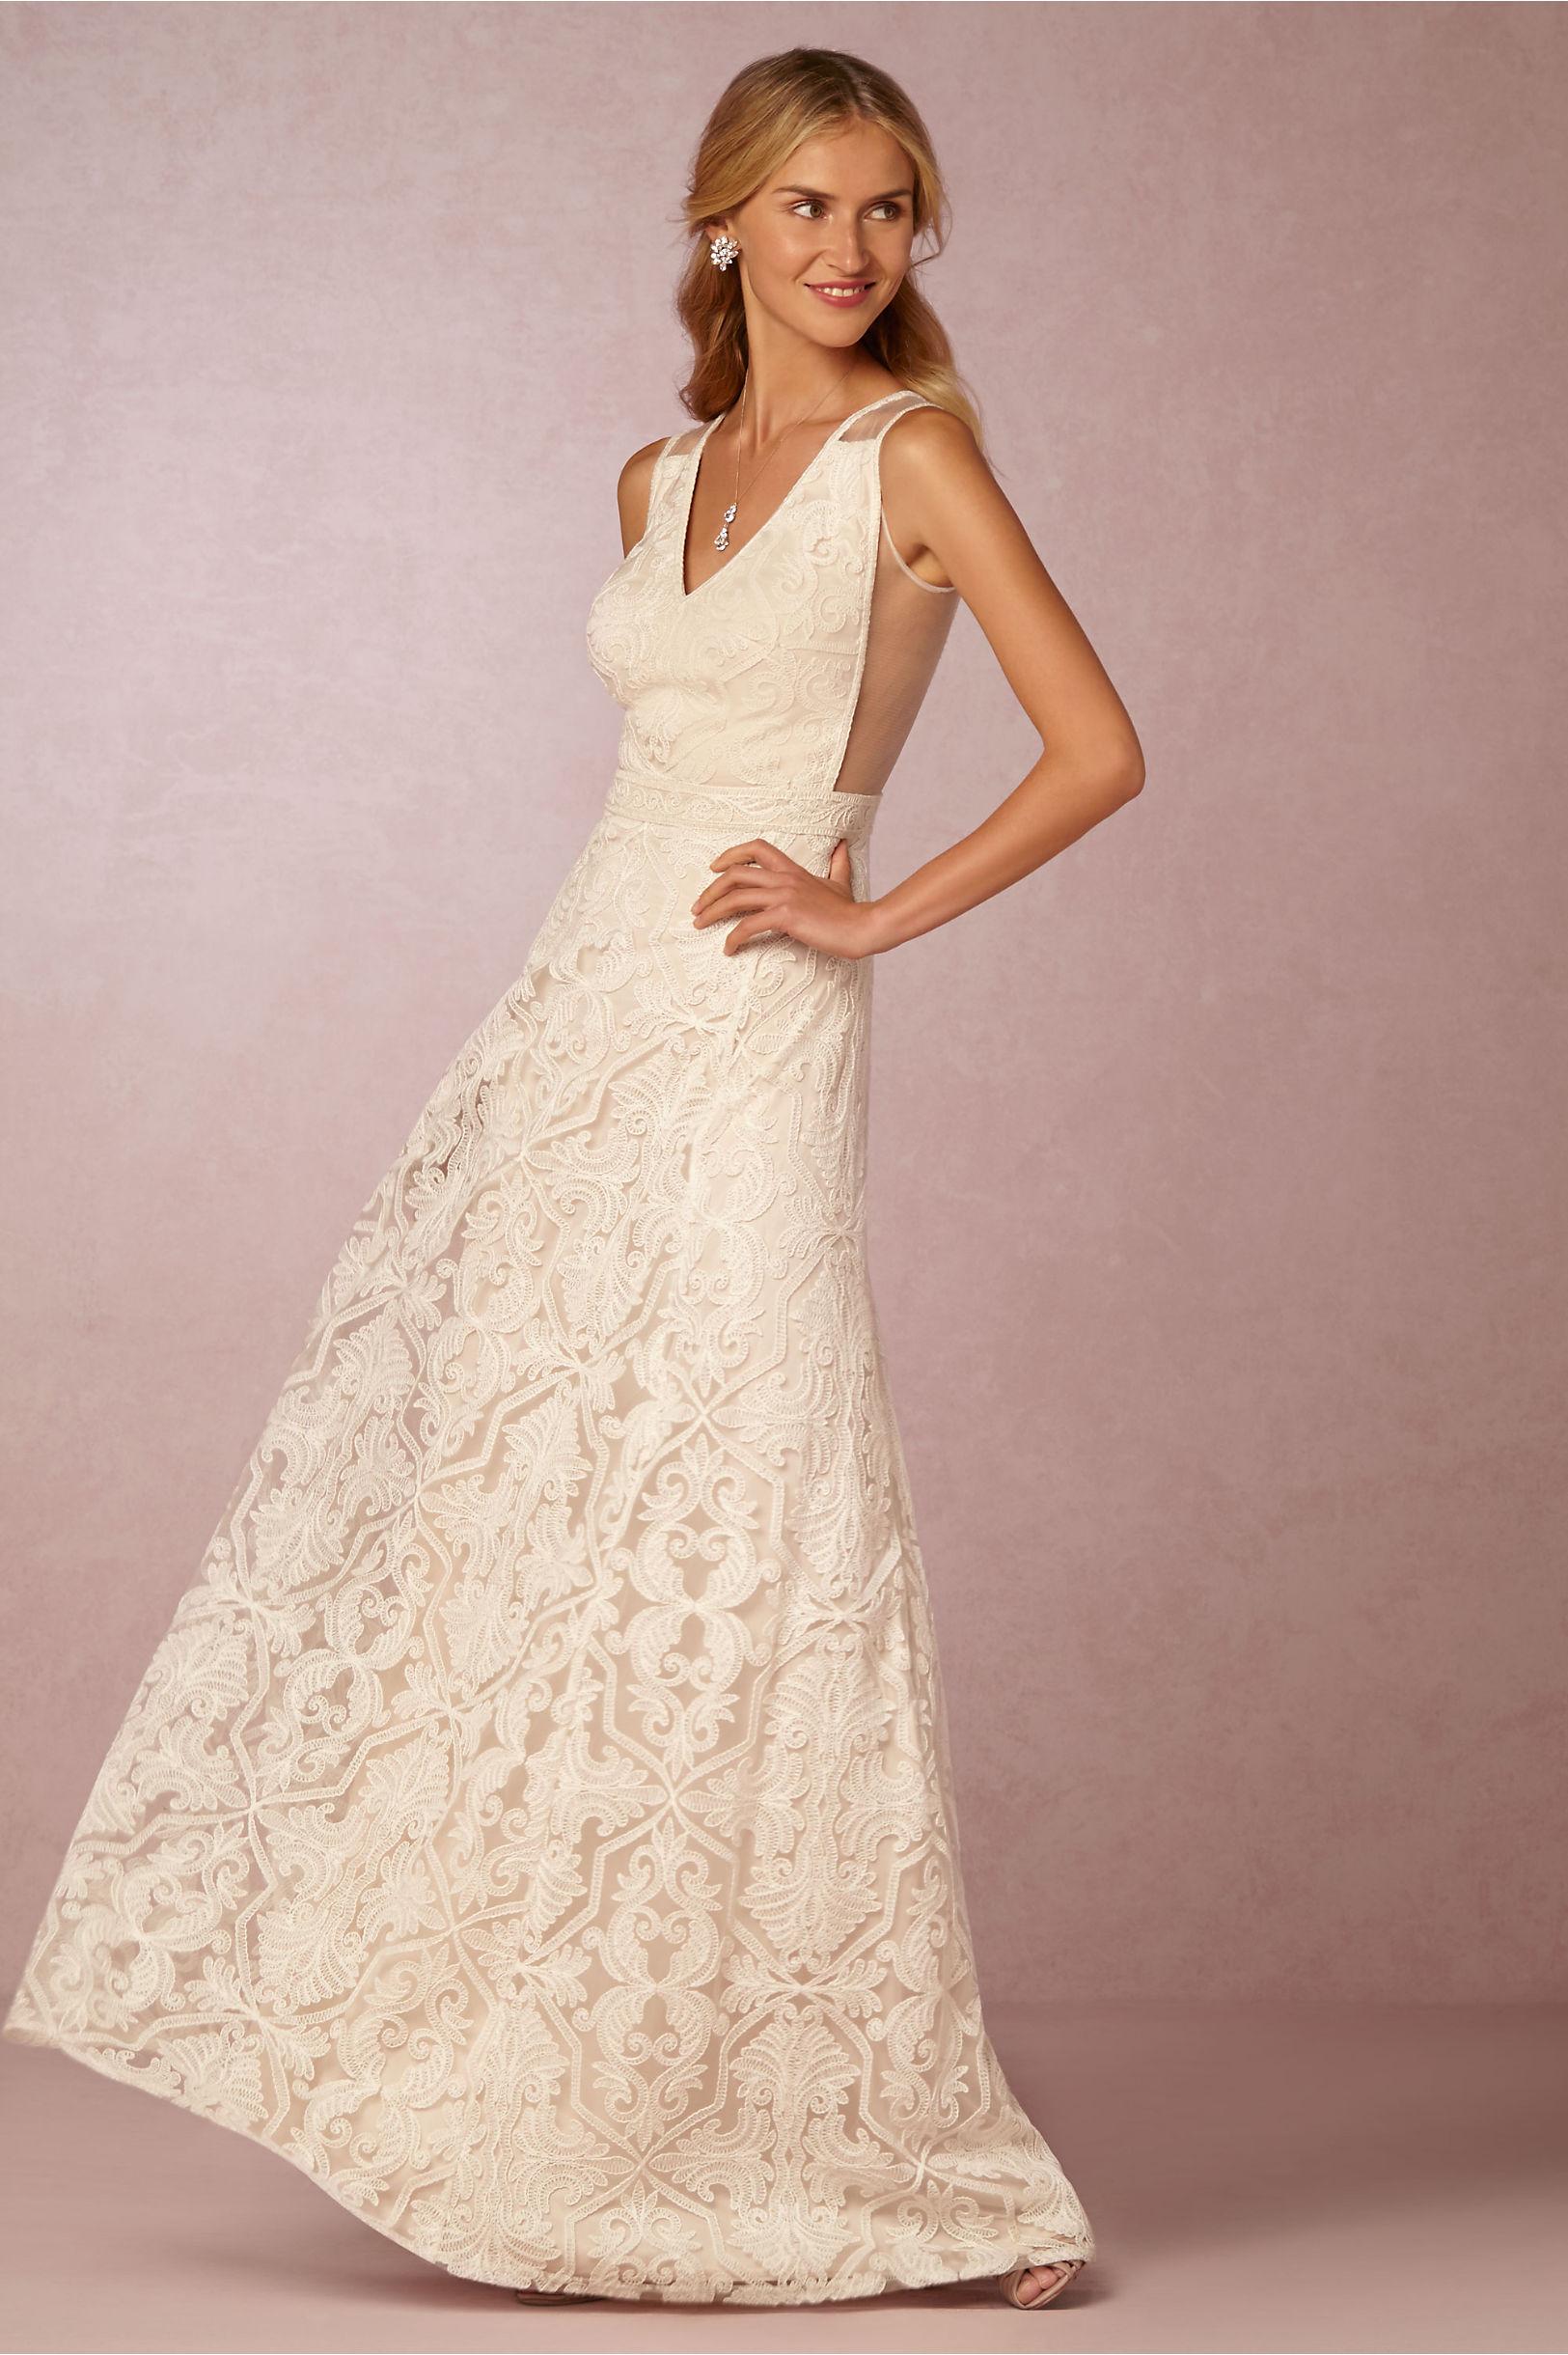 Superb Tadashi Shoji Ivory/Petal Pendleton Gown | BHLDN